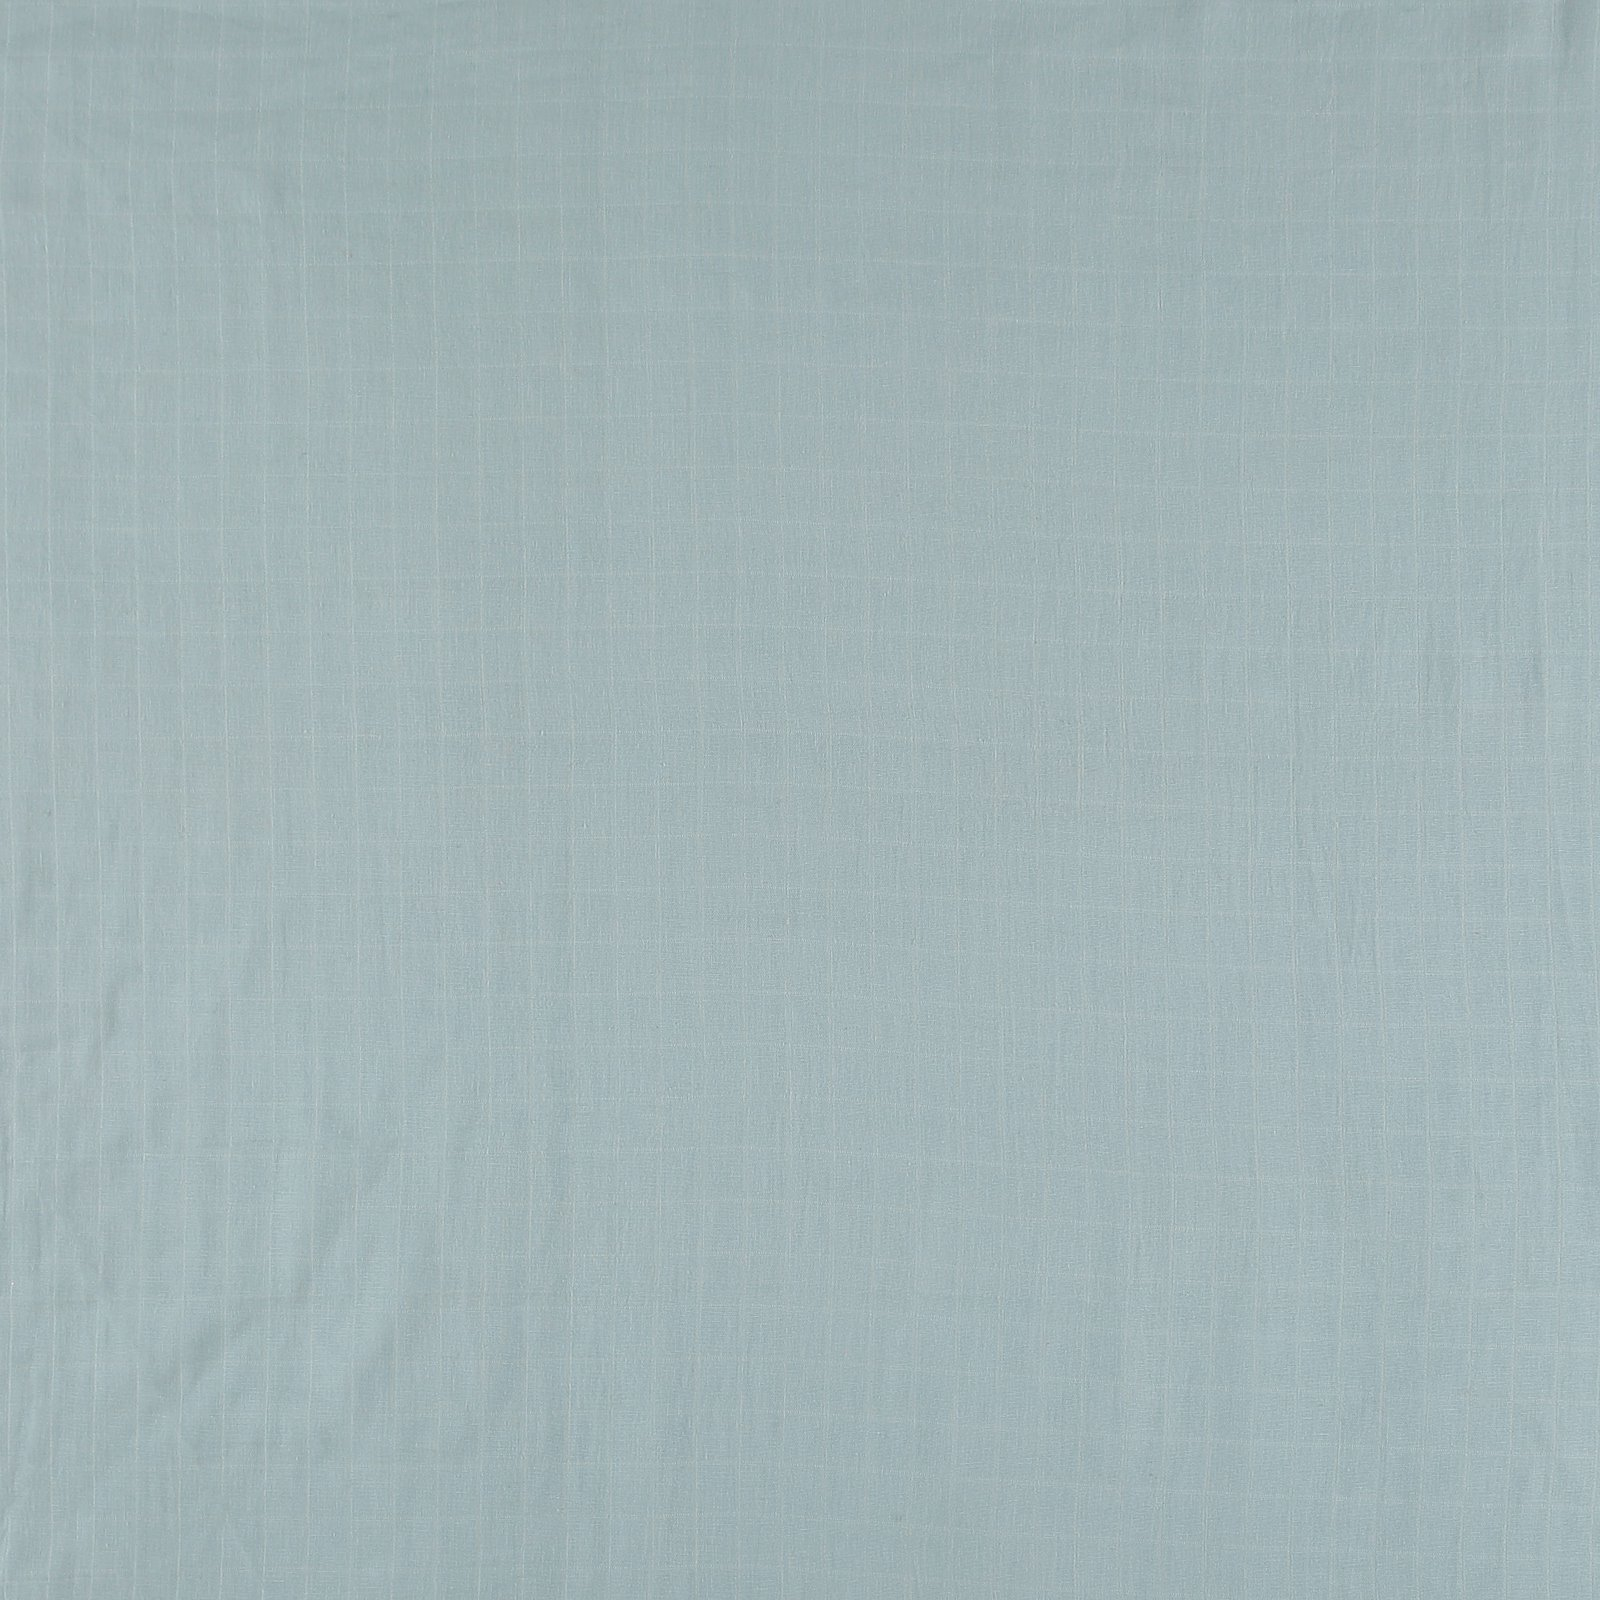 Muslin lightblue 501712_pack_solid